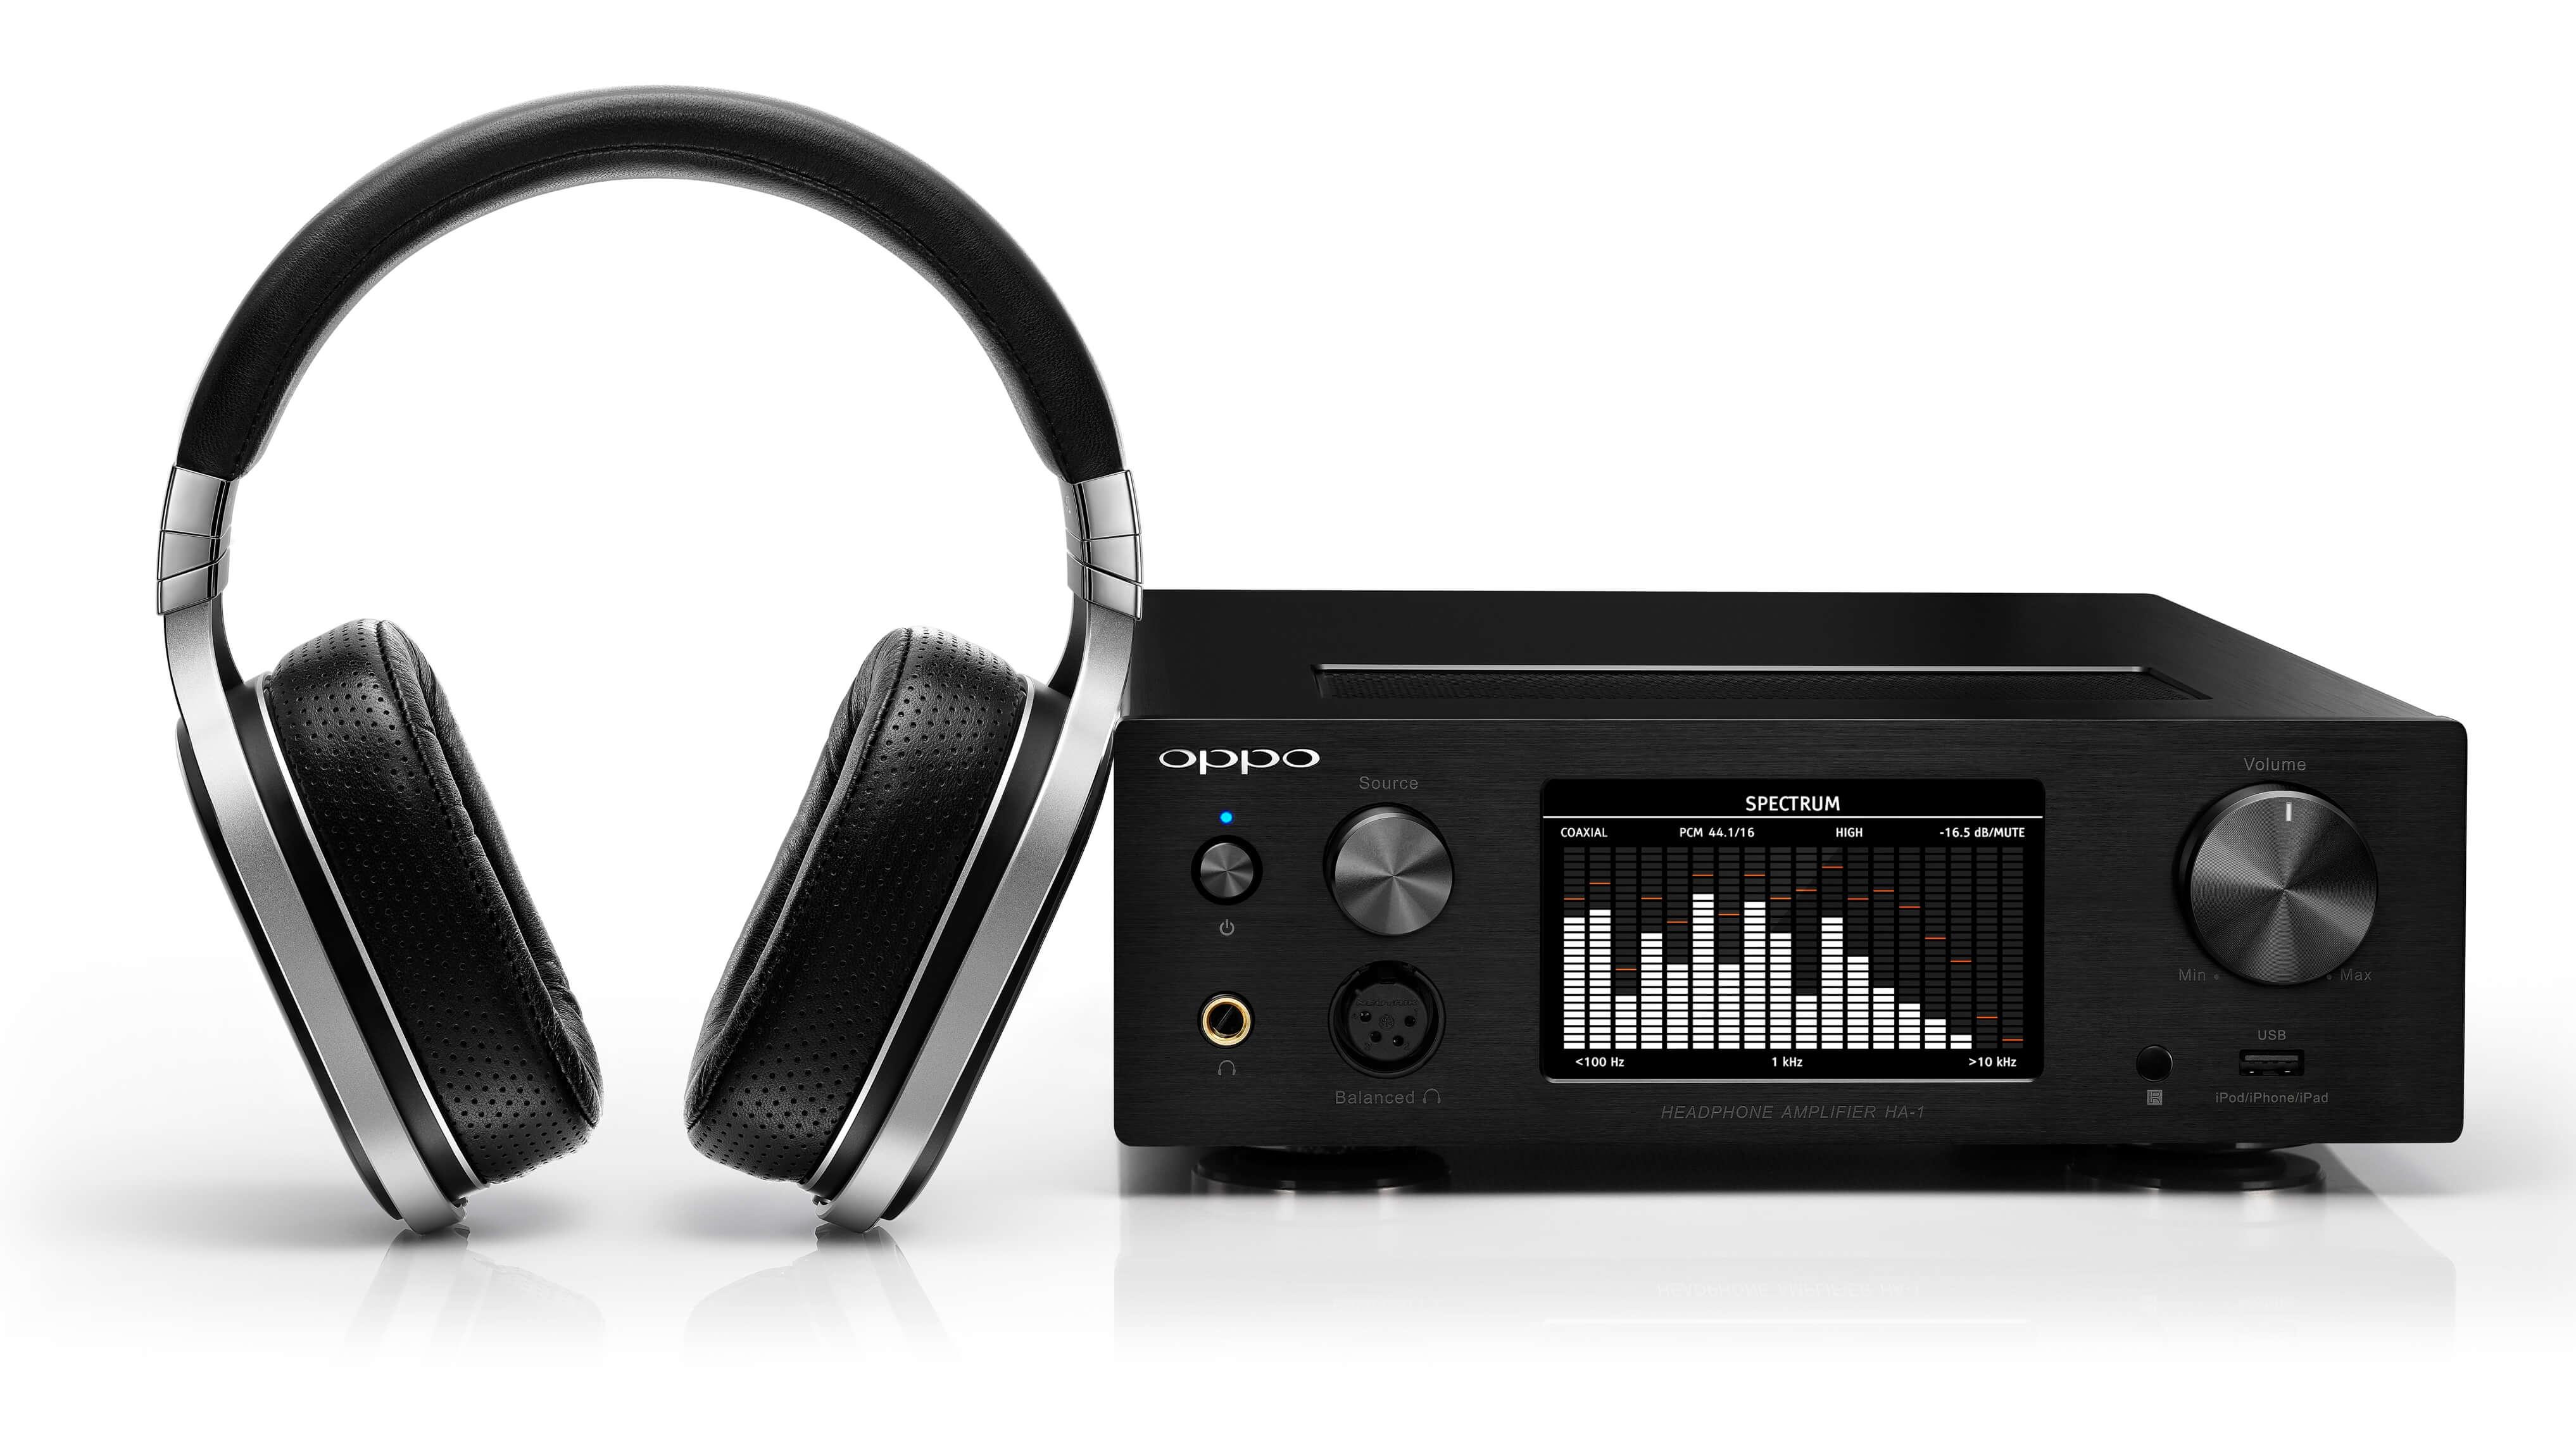 headphone impedance